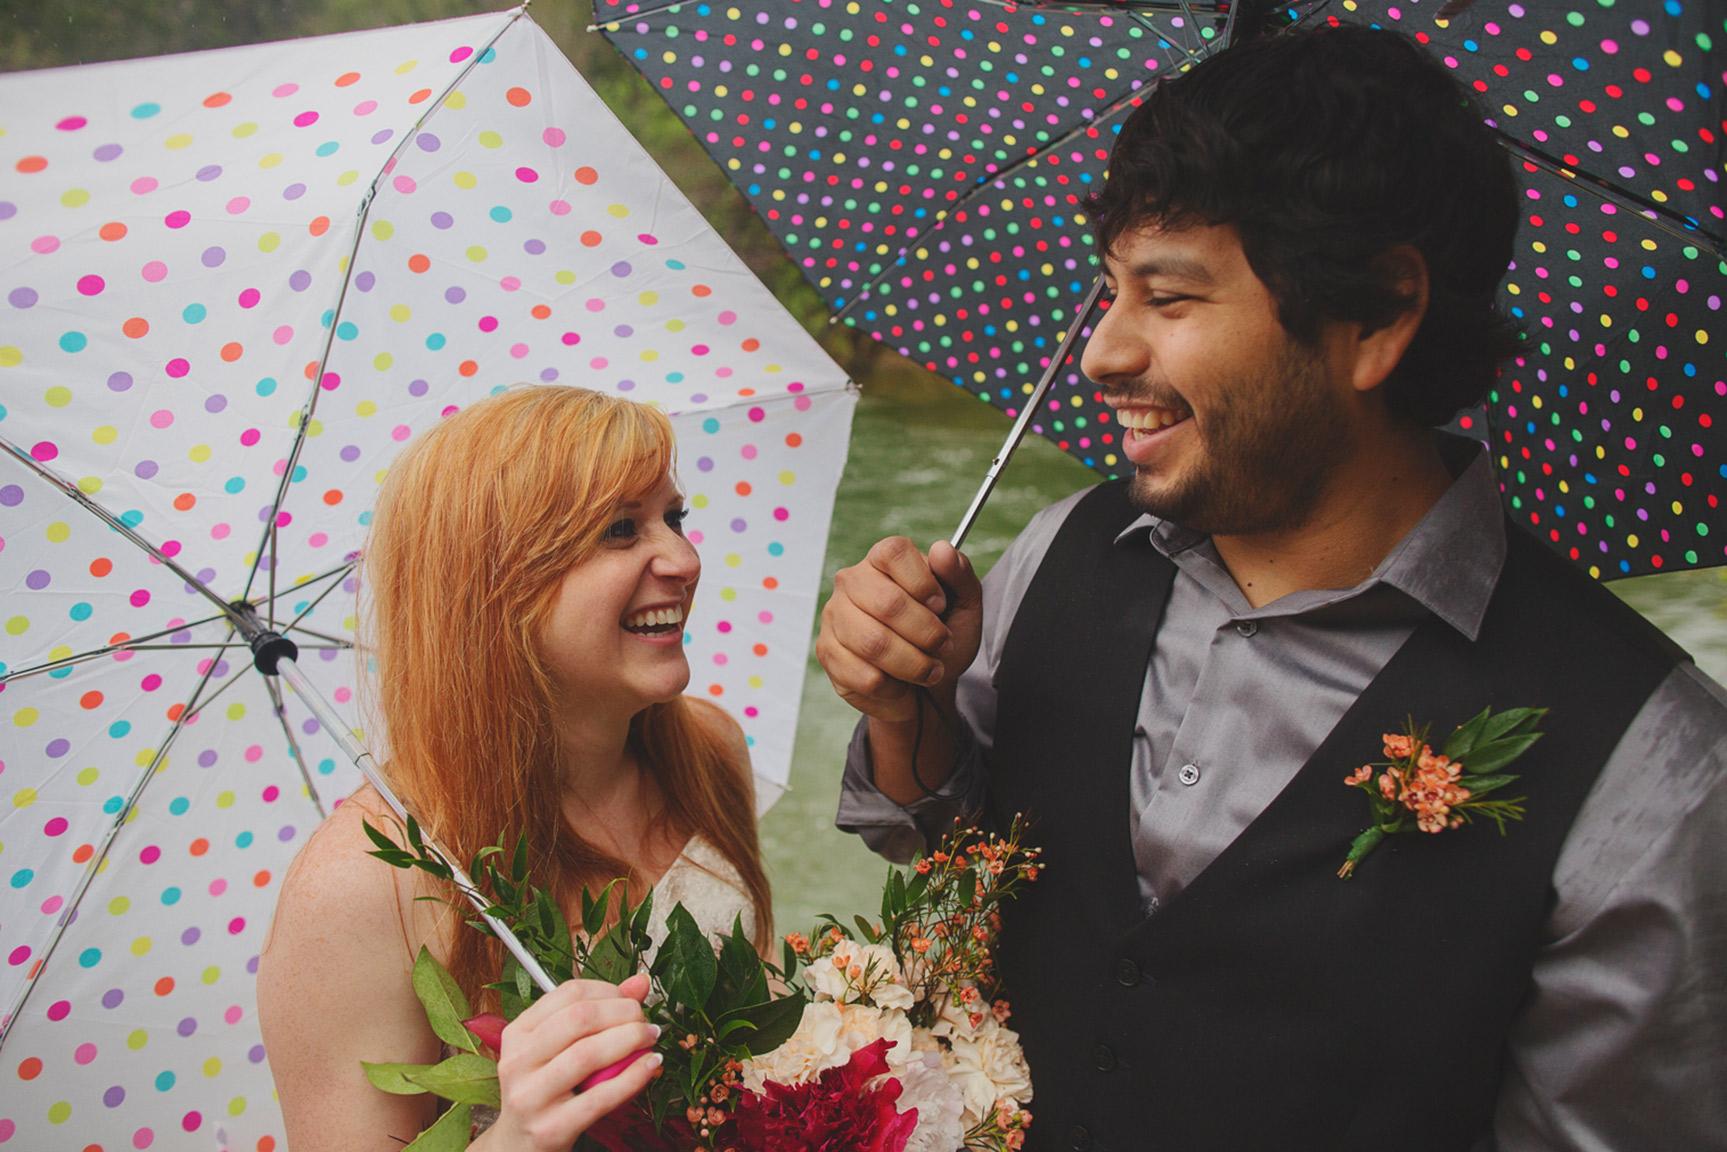 PhotobyBetsy-elopement021.jpg